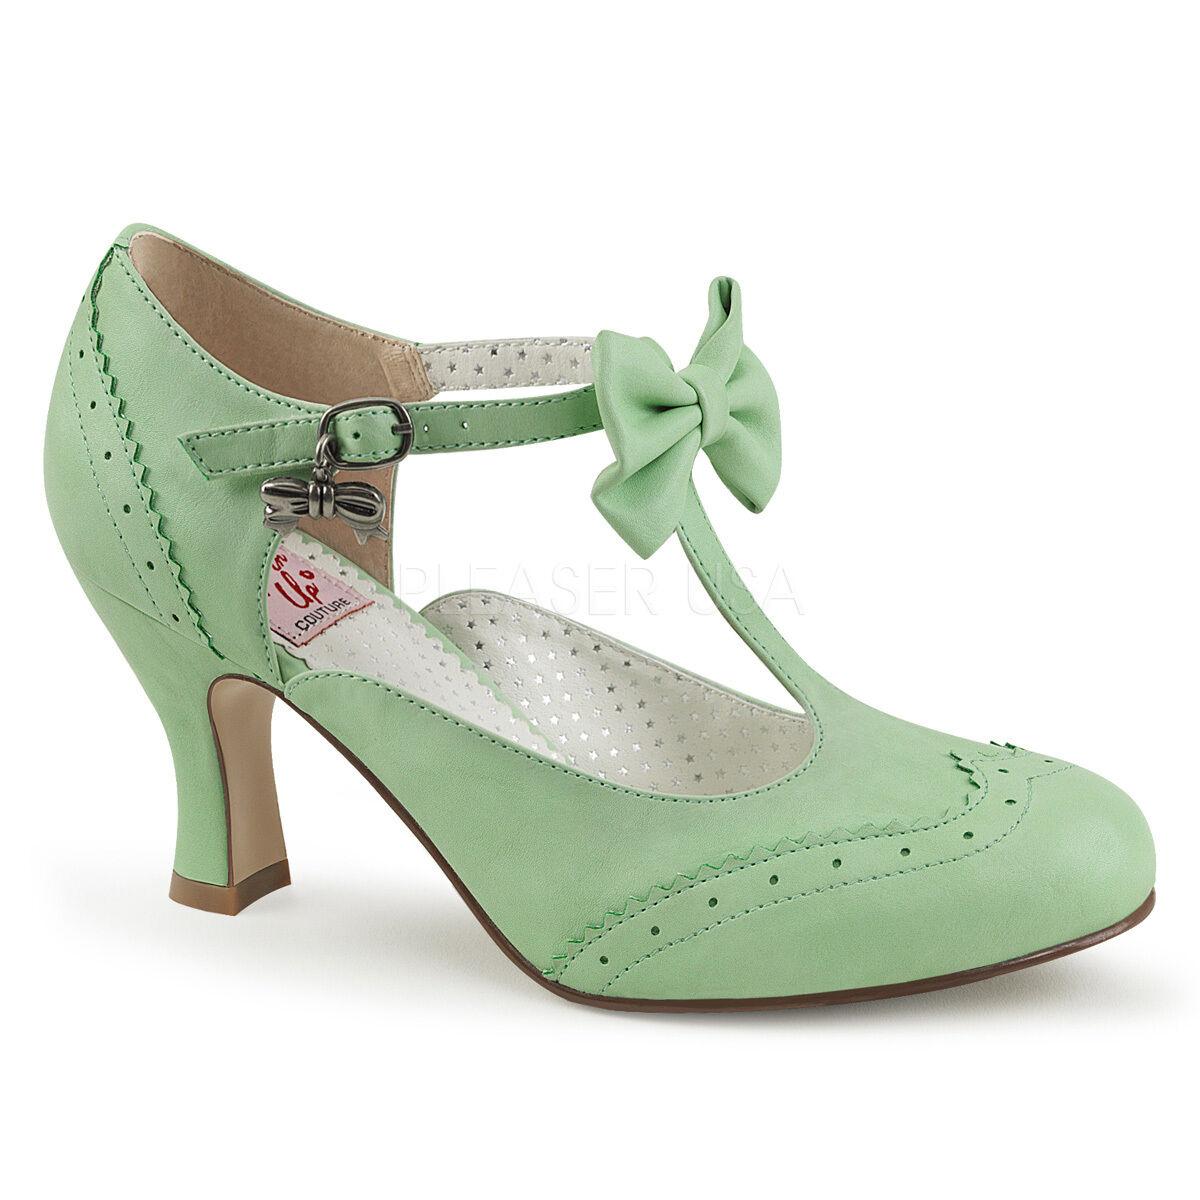 "Sexy 3"" Kitten Heel Round Toe Wingtip T-Strap Mint Green Pumps Shoes FLAP11/MTPU"